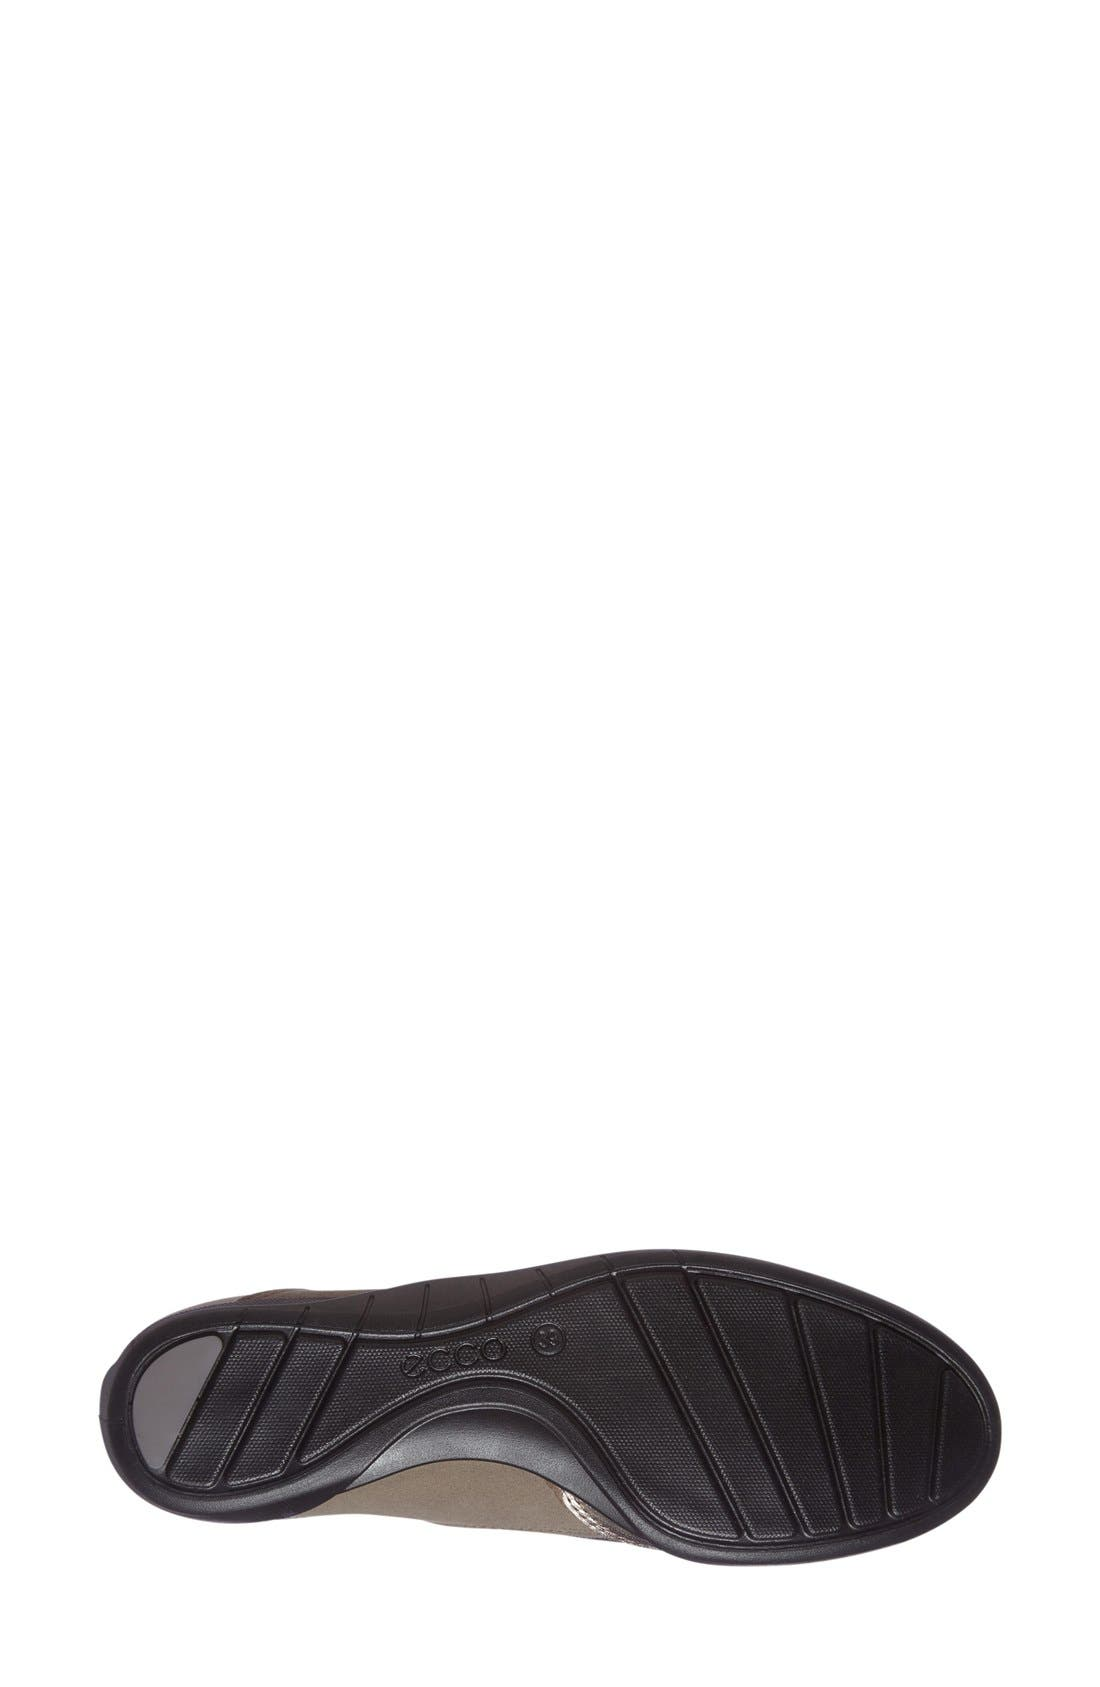 'Bluma' Sneaker,                             Alternate thumbnail 4, color,                             Grey Leather Fabric